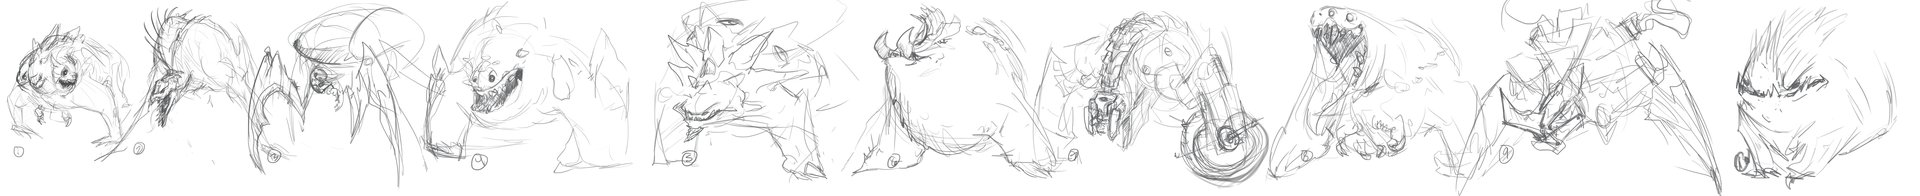 Carlo spagnola oculus rift creature sketches